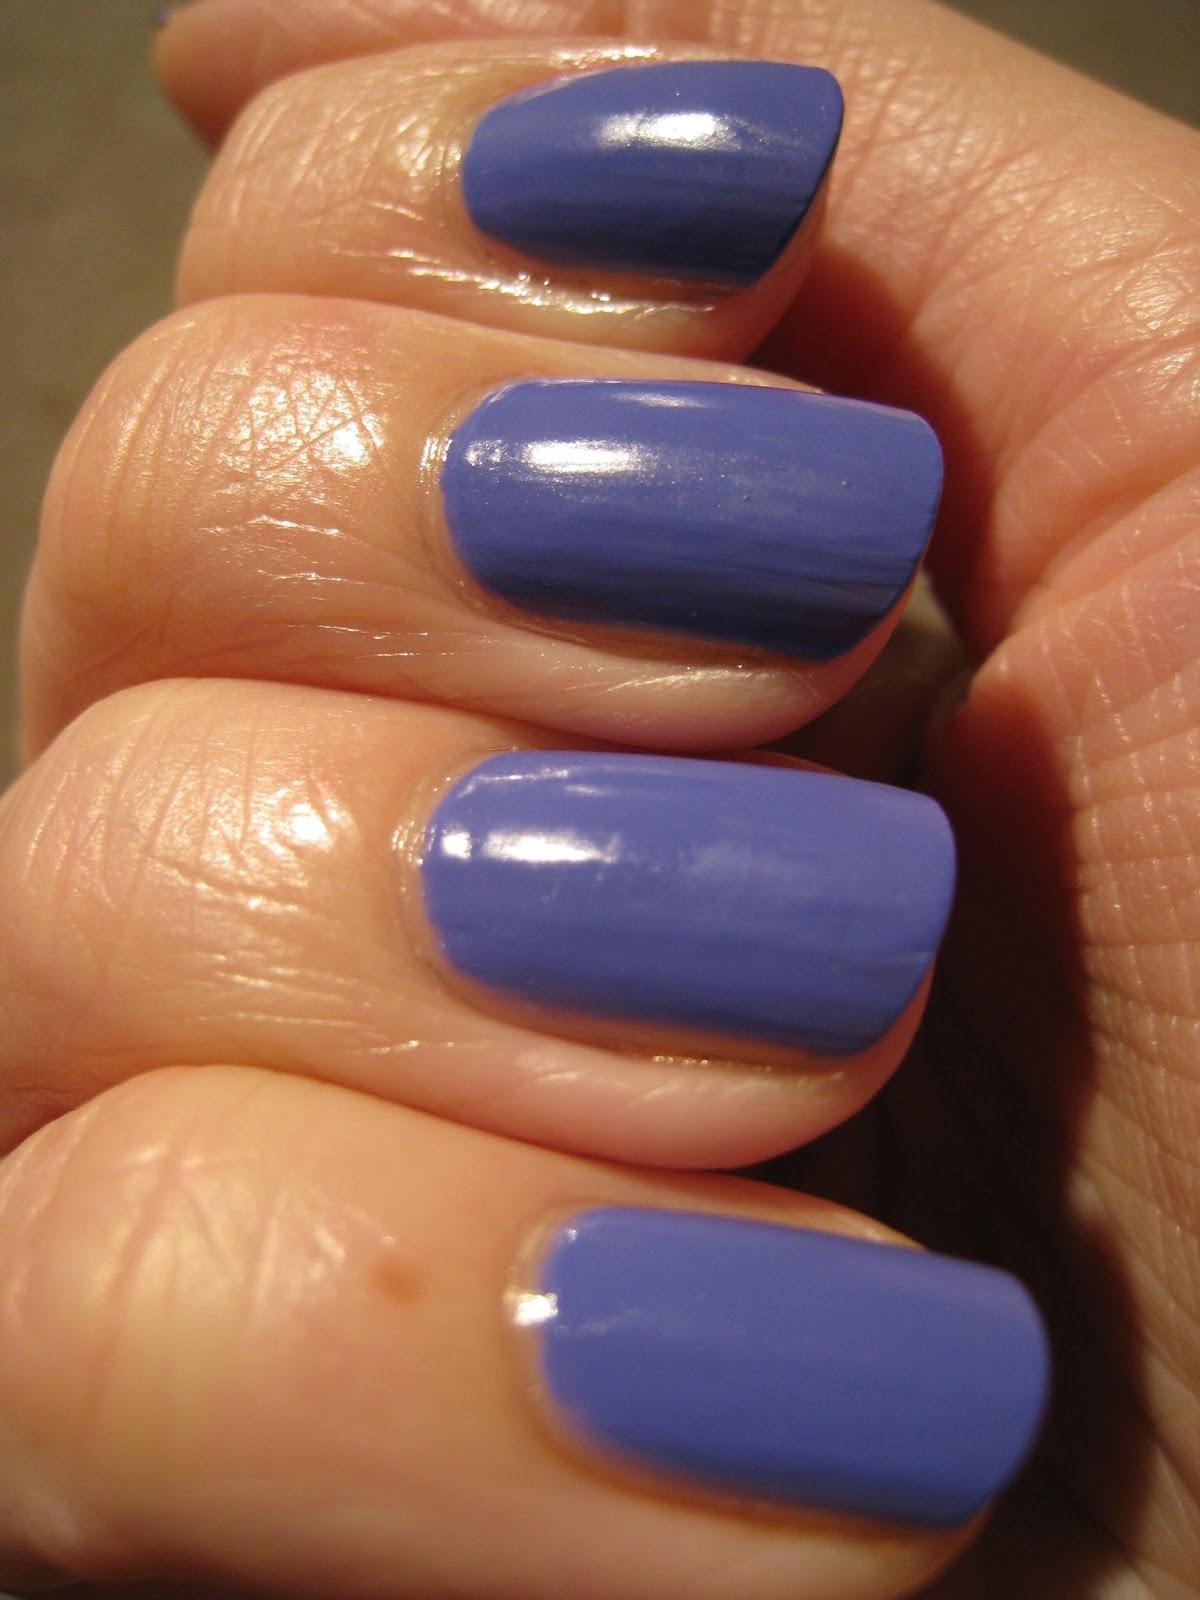 electric purple nail polish - photo #15